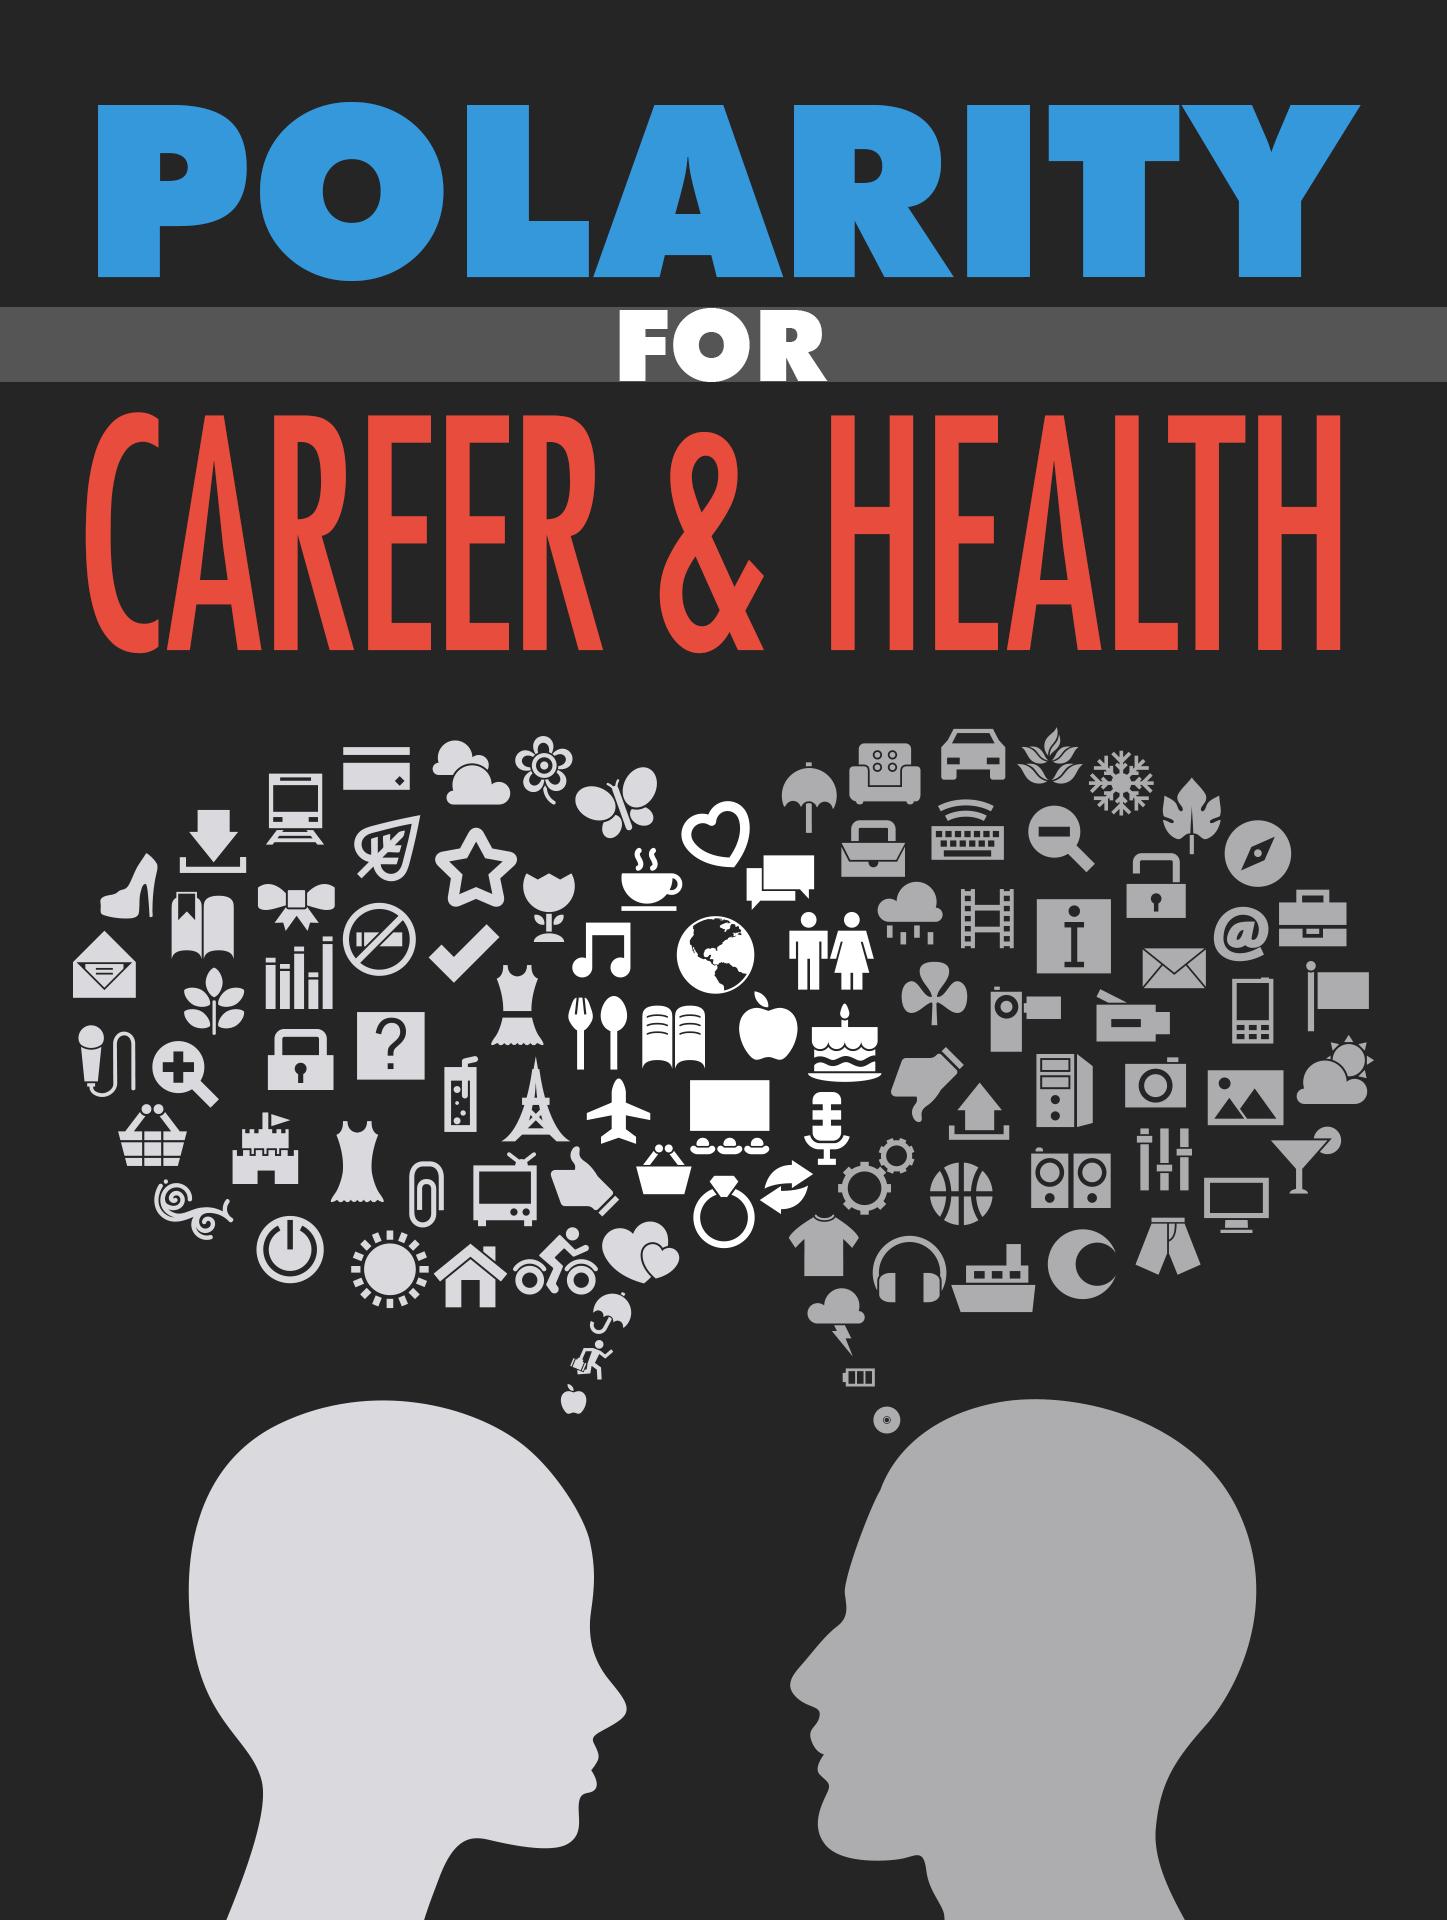 Polarity For Career & Health Ebook's Ebook Image